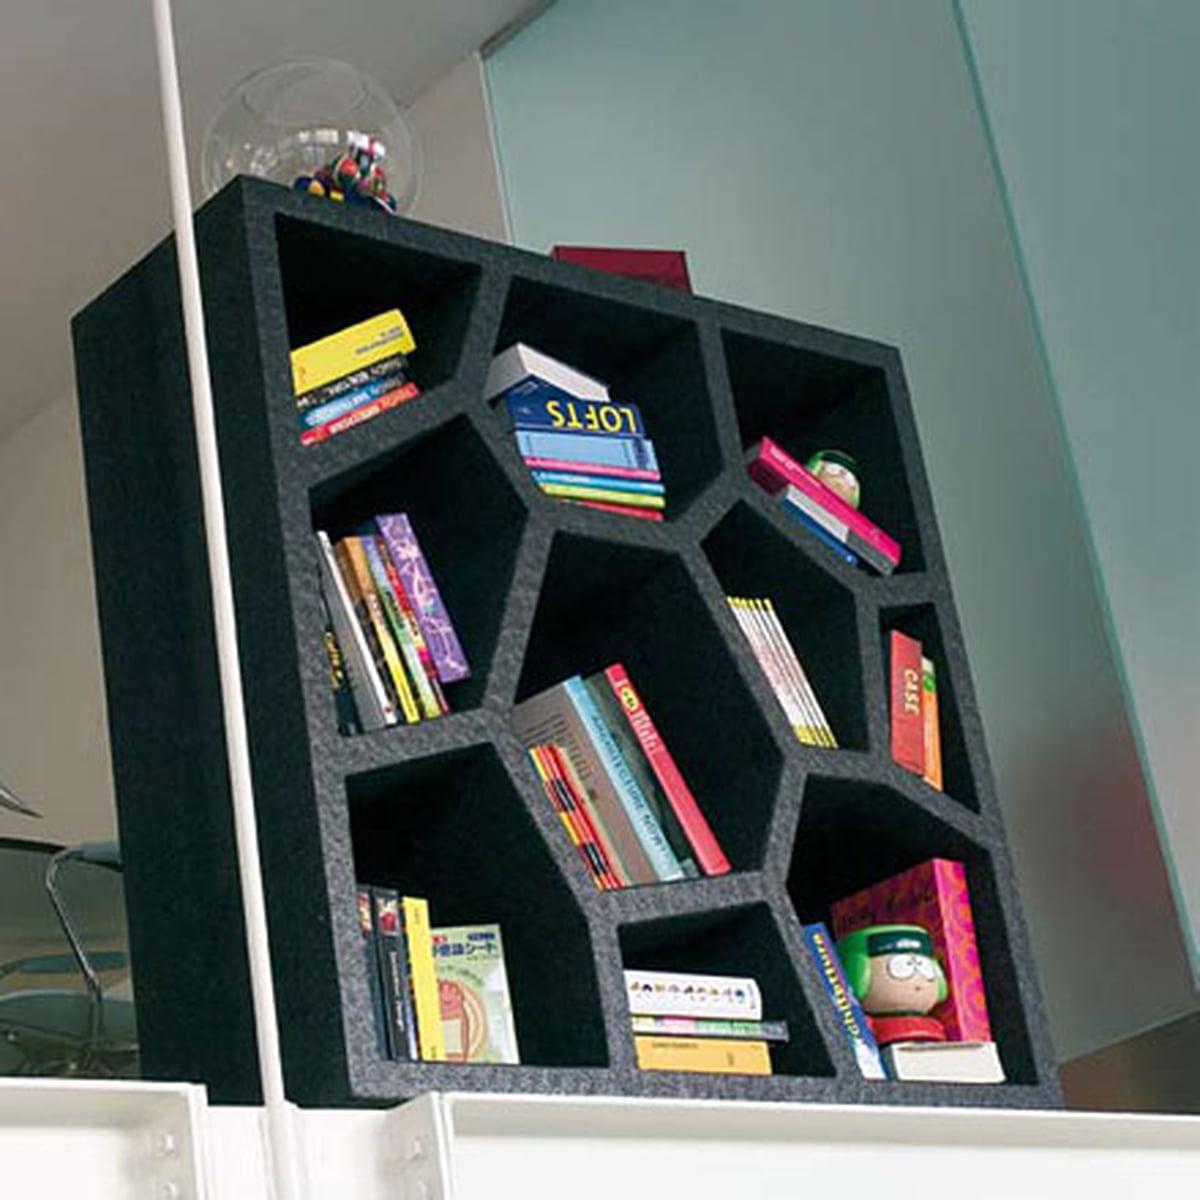 Opus incertum shelf casamania shop - Opus incertum casamania ...